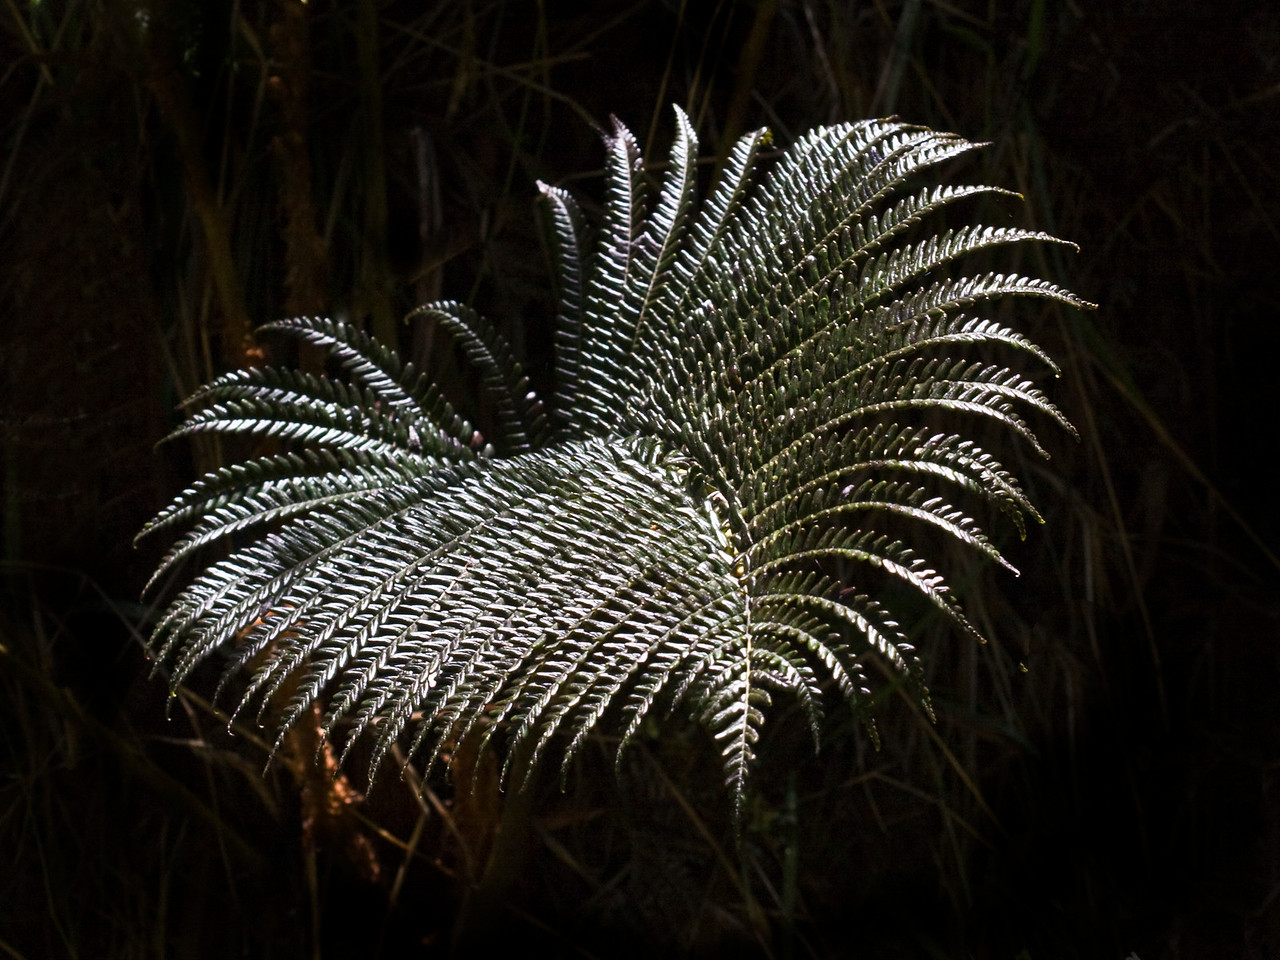 Sadleria fern in Waikamoi Preserve (East Maui) (July 2010)  Copyright (c) 2010 by Philip A. Thomas (imagesbypt@philipt.com)